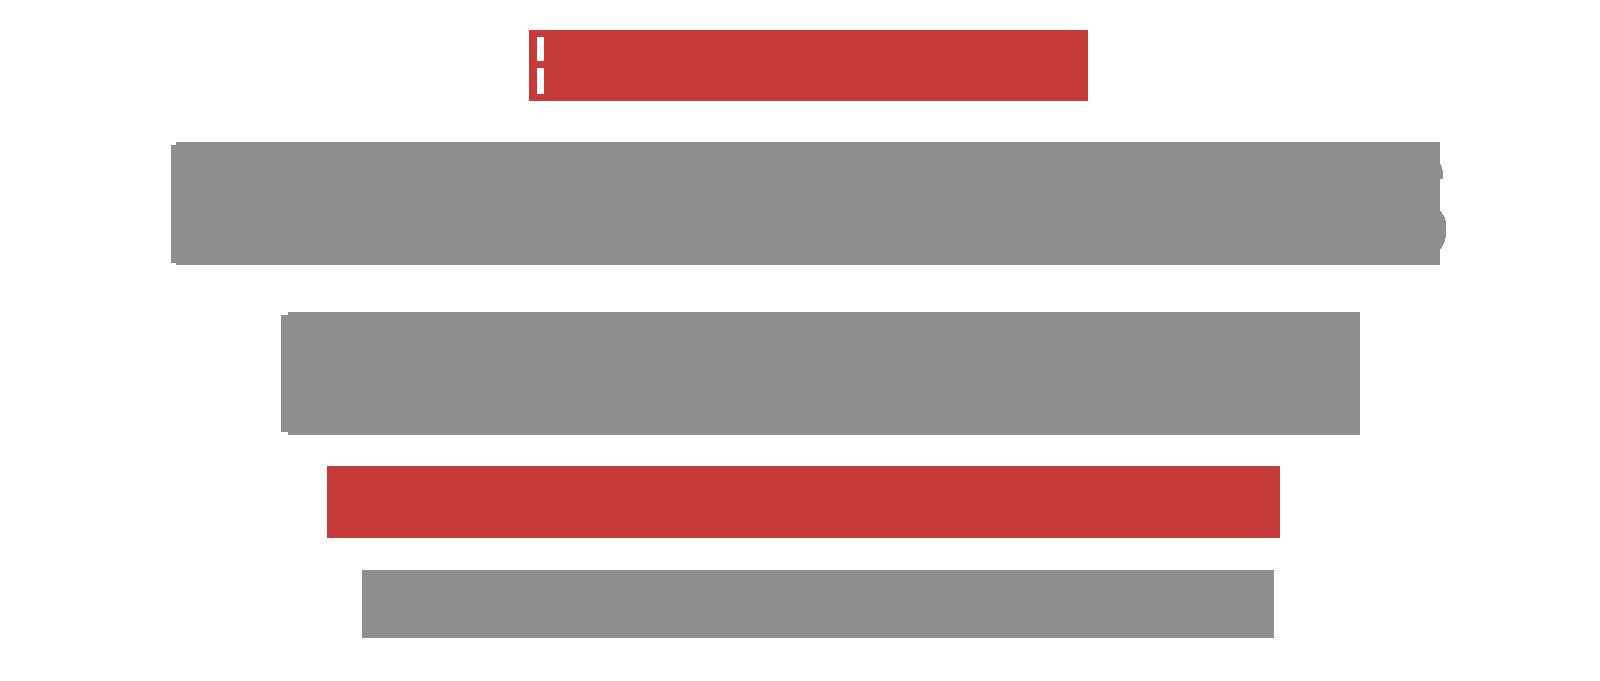 Extended Masterclass Barcelona 2015